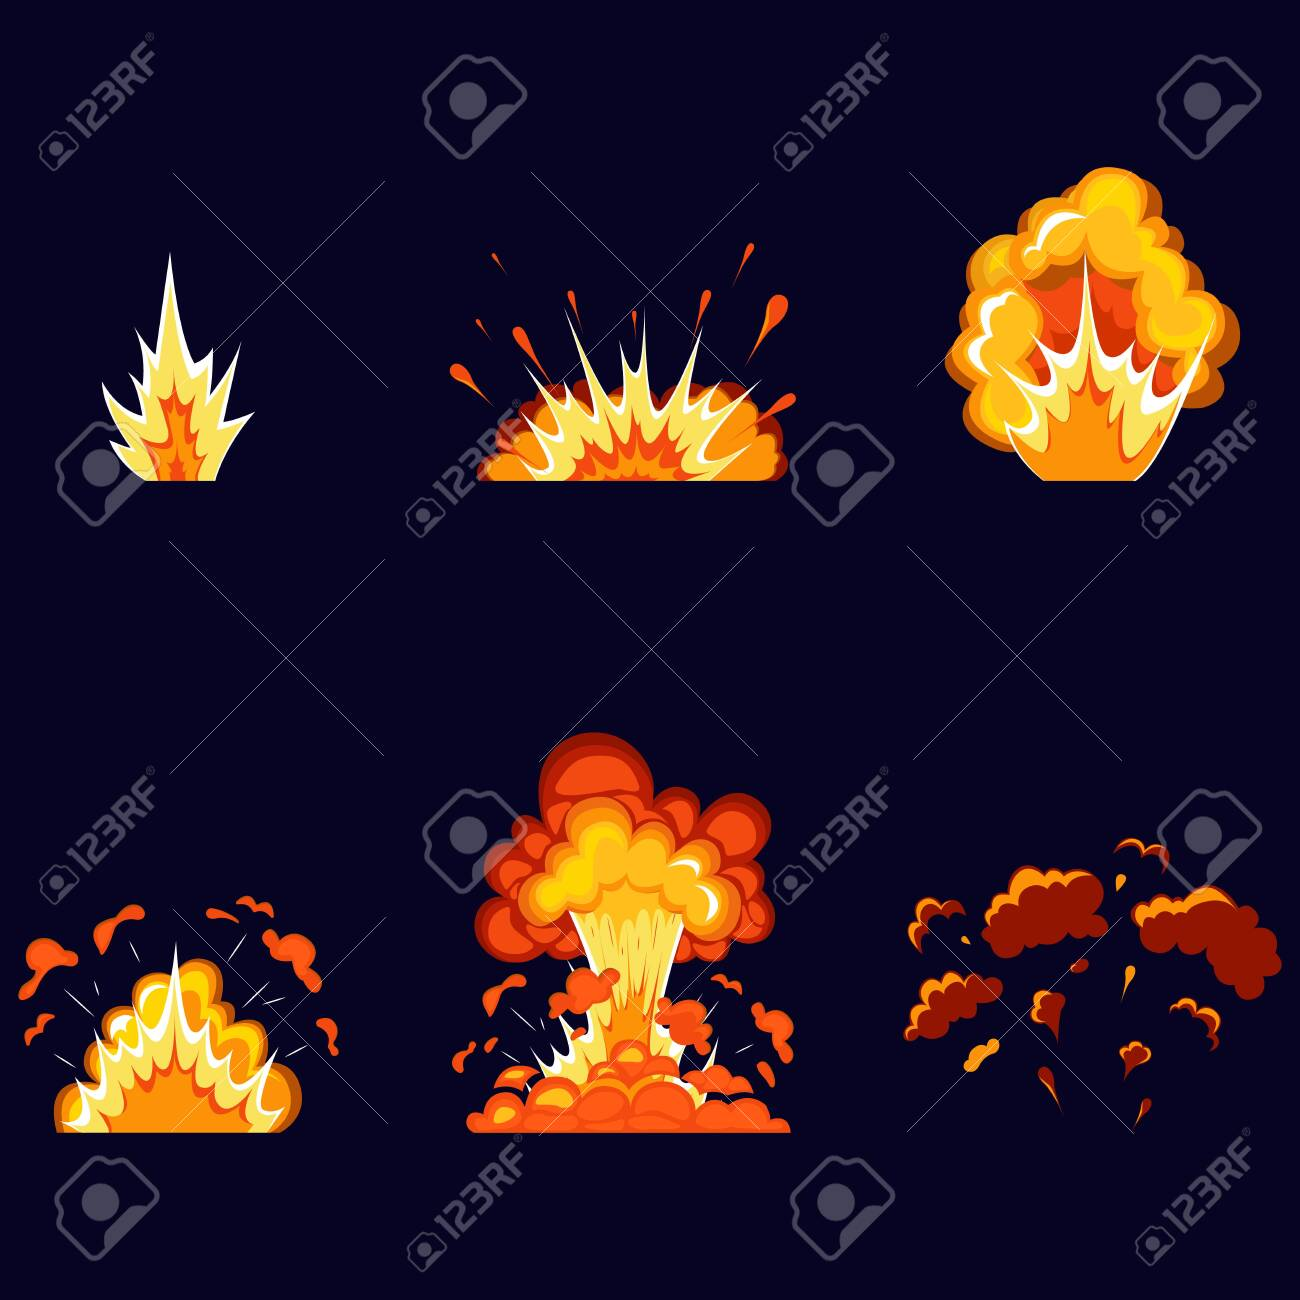 Cartoon explosion effect with smoke. Boom effect, detonate flash, comic bomb. Dynamite explosions, explosive explosions of bombs and atomic bombs, clouds, comics. - 145414608